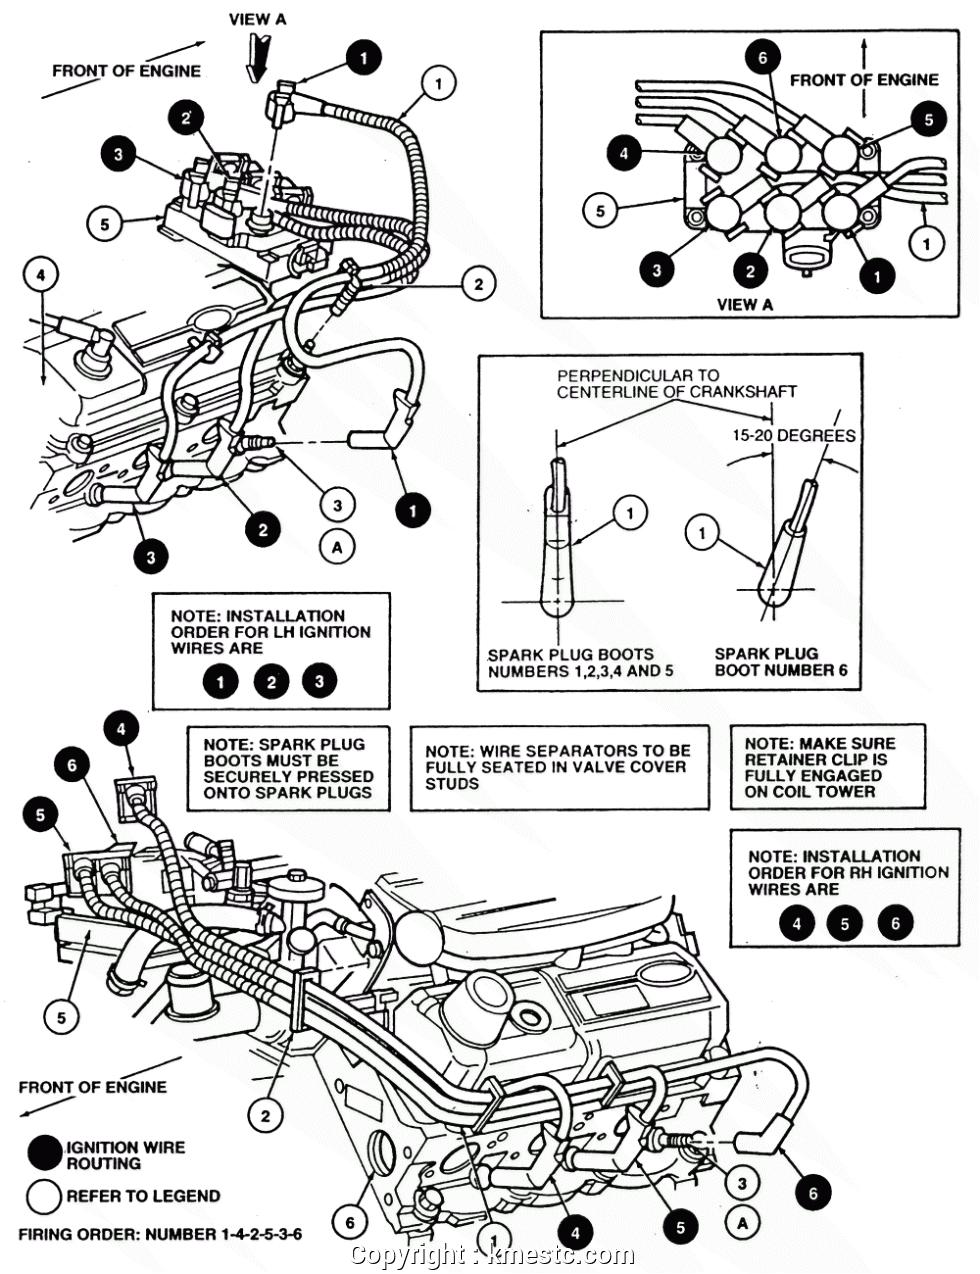 diagram spark plug wire separators wiring diagram toolboxmustang spark plug wire diagram wiring diagram centre diagram